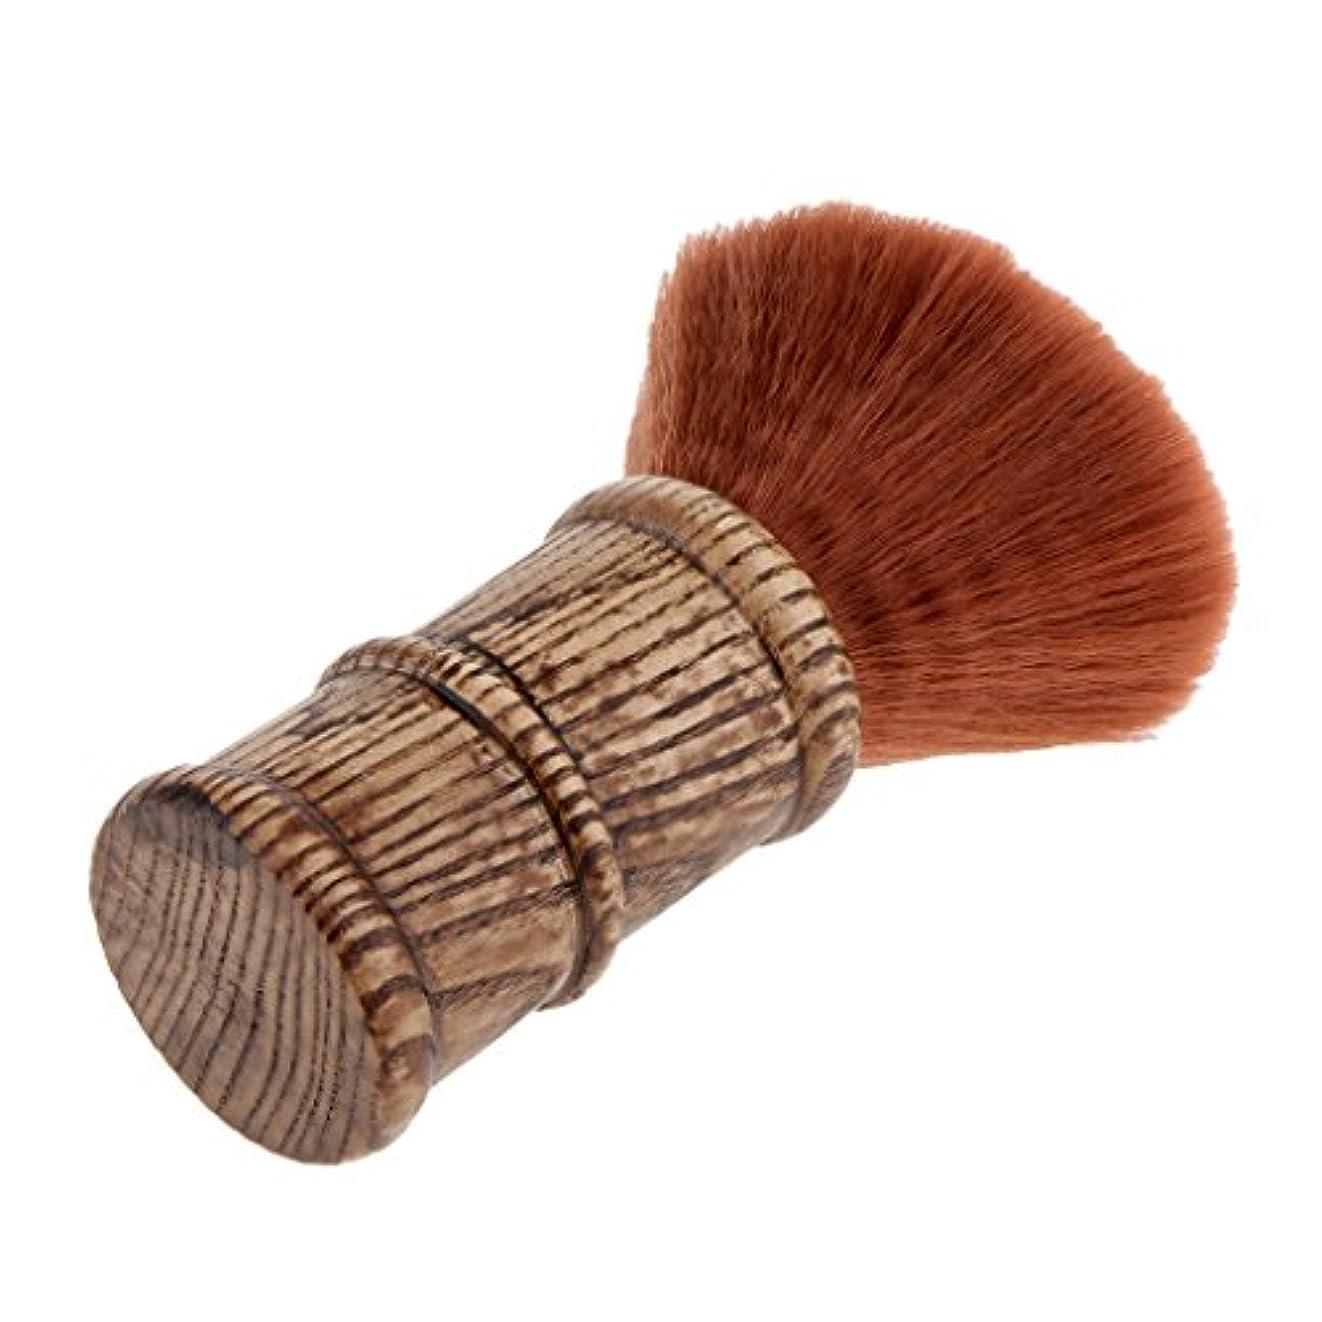 Kesoto ネックダスターブラシ ヘアカットブラシ ヘアカット 散髪 ブラシ プロ サロン 柔らかい 清掃 2色選べる - 褐色